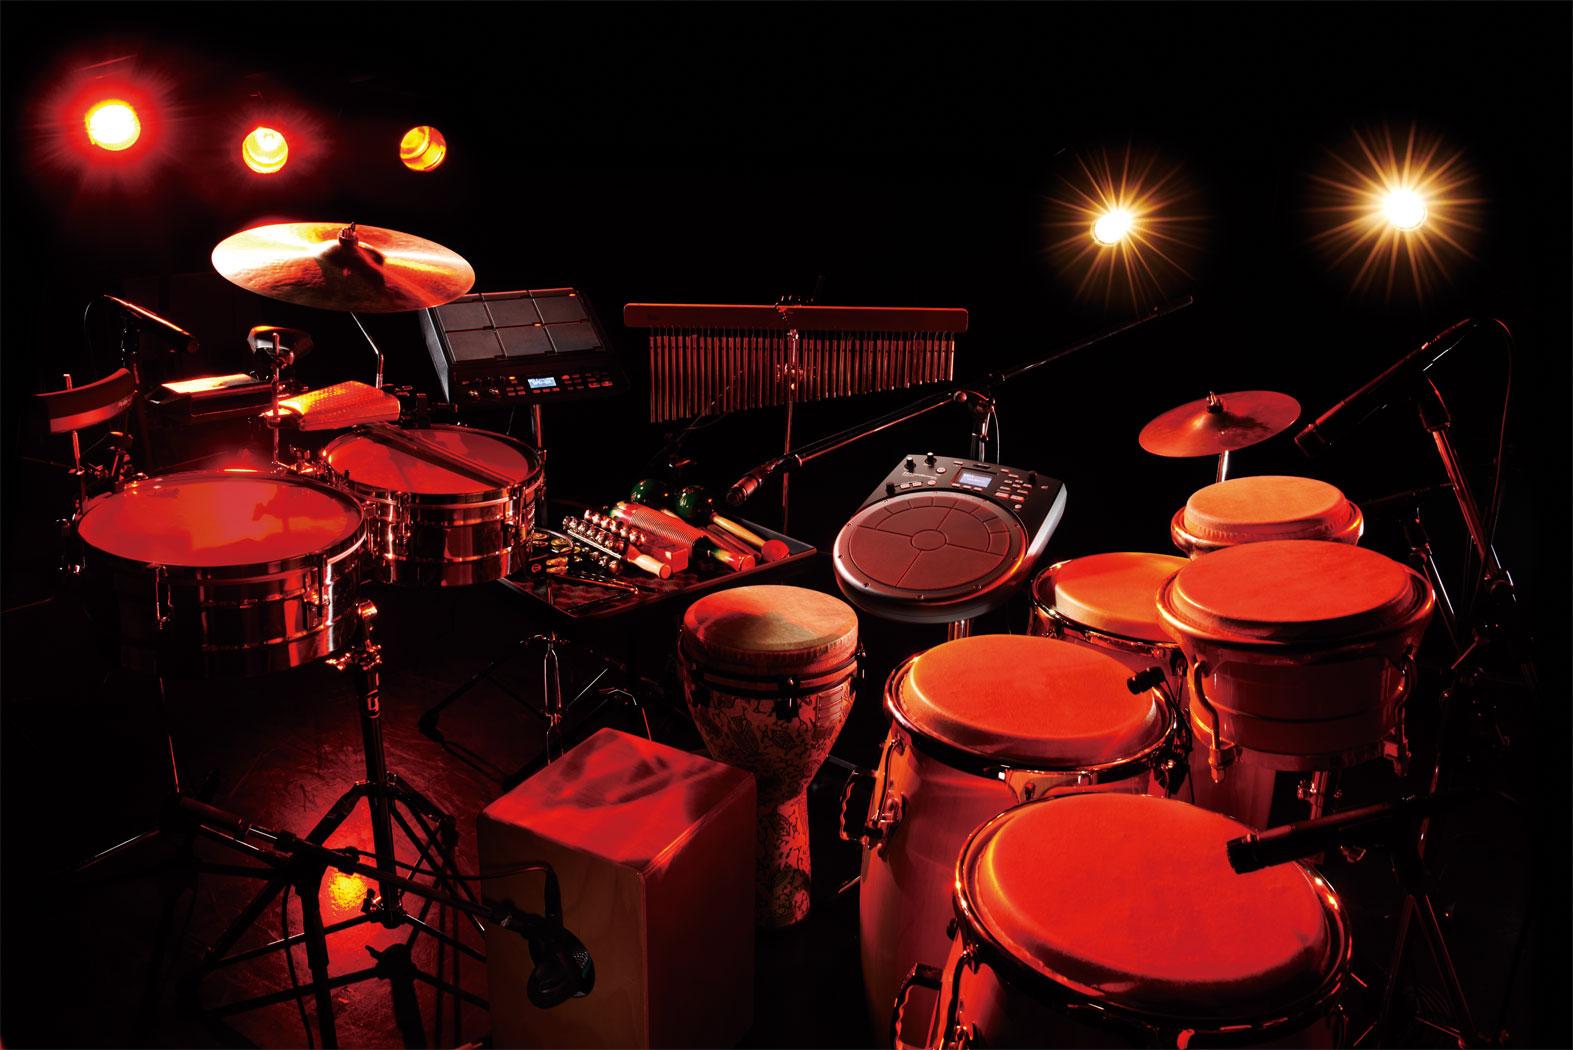 roland handsonic hpd 20 digital hand percussion. Black Bedroom Furniture Sets. Home Design Ideas